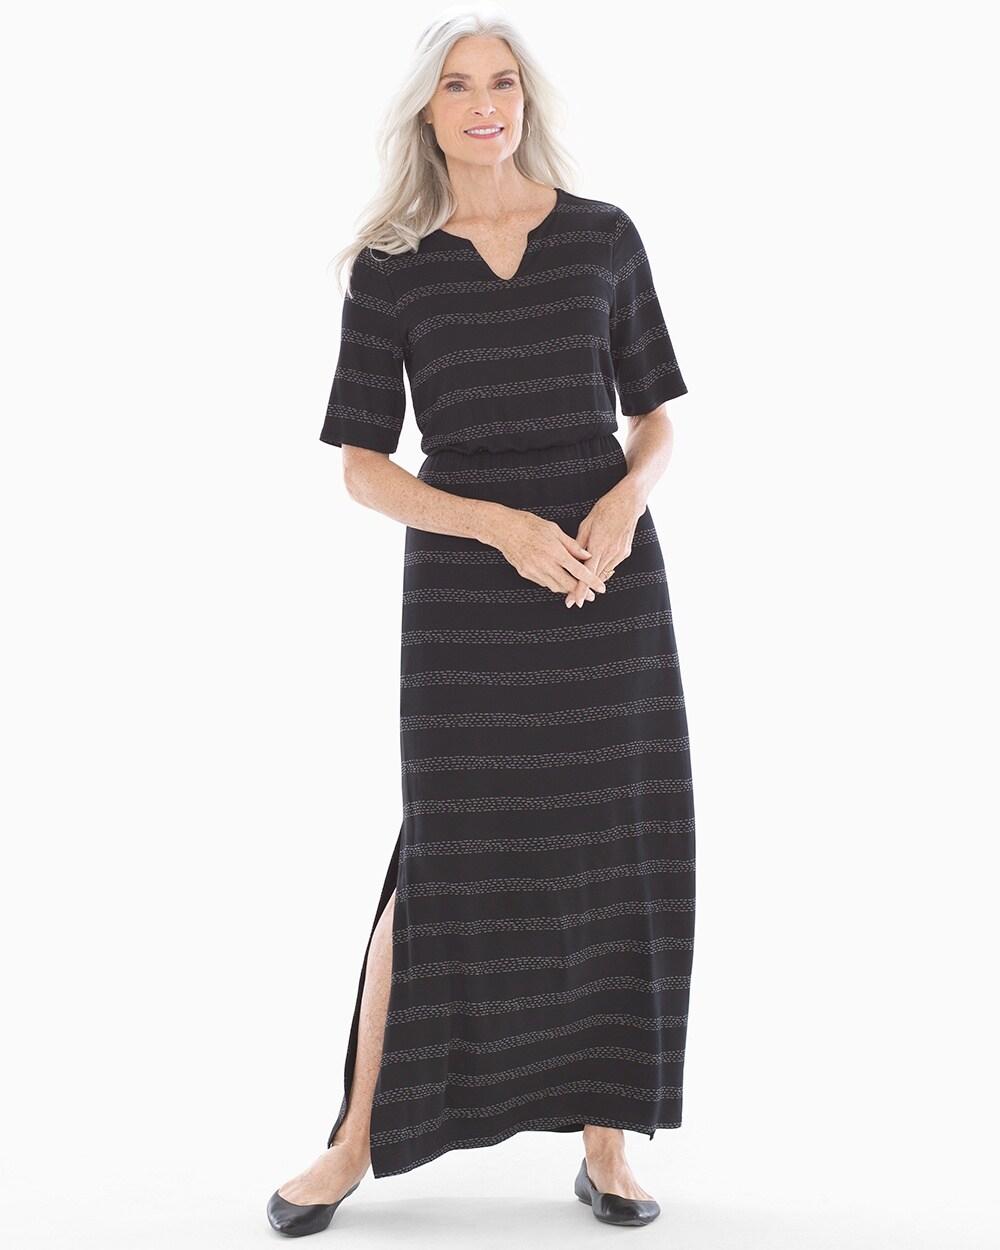 648f385e51d Elbow Sleeve Maxi Dress - Soma